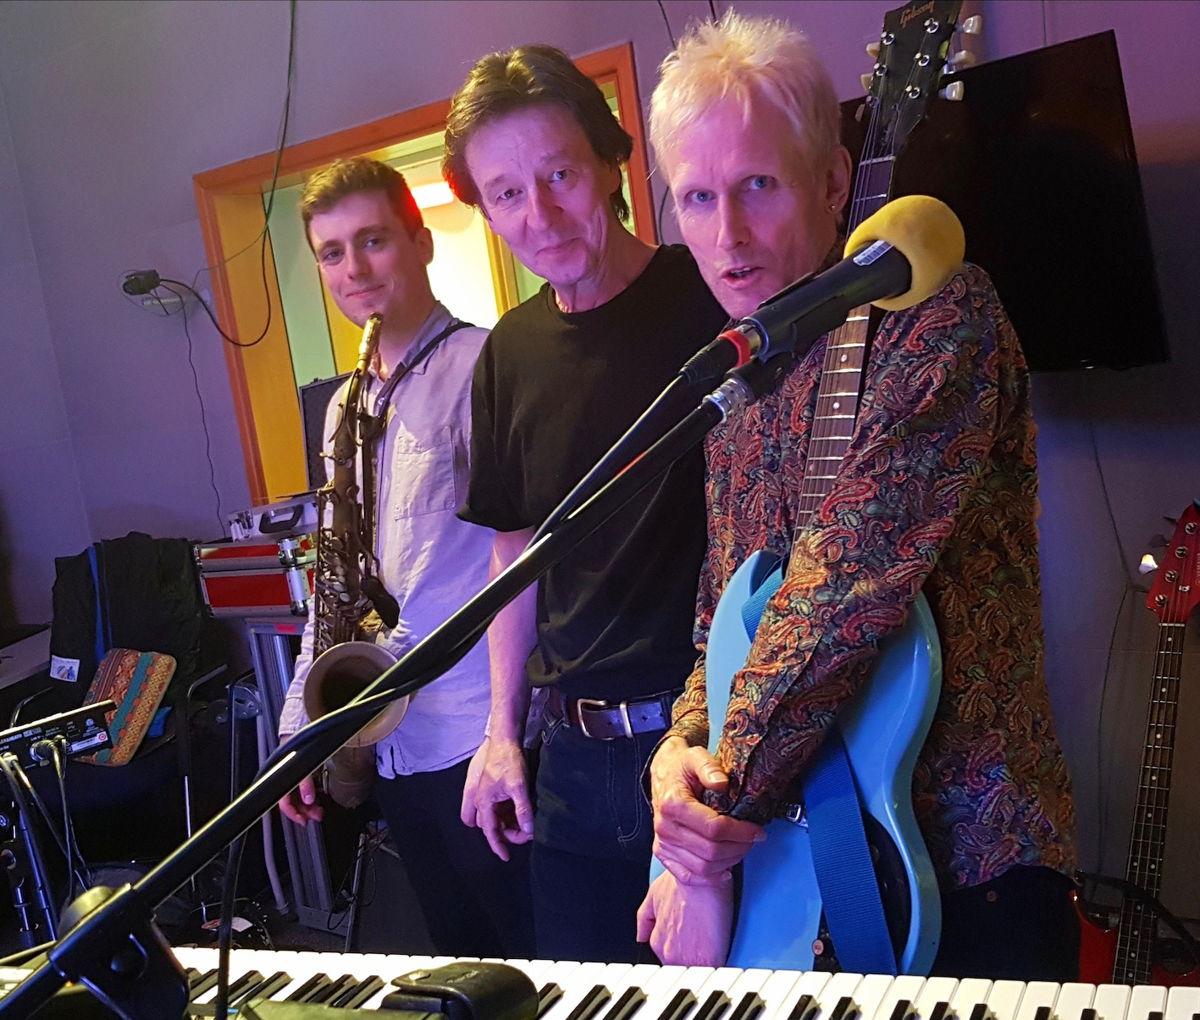 Fiat Lux - Will Howard, Steve Wright, David P Crickmore